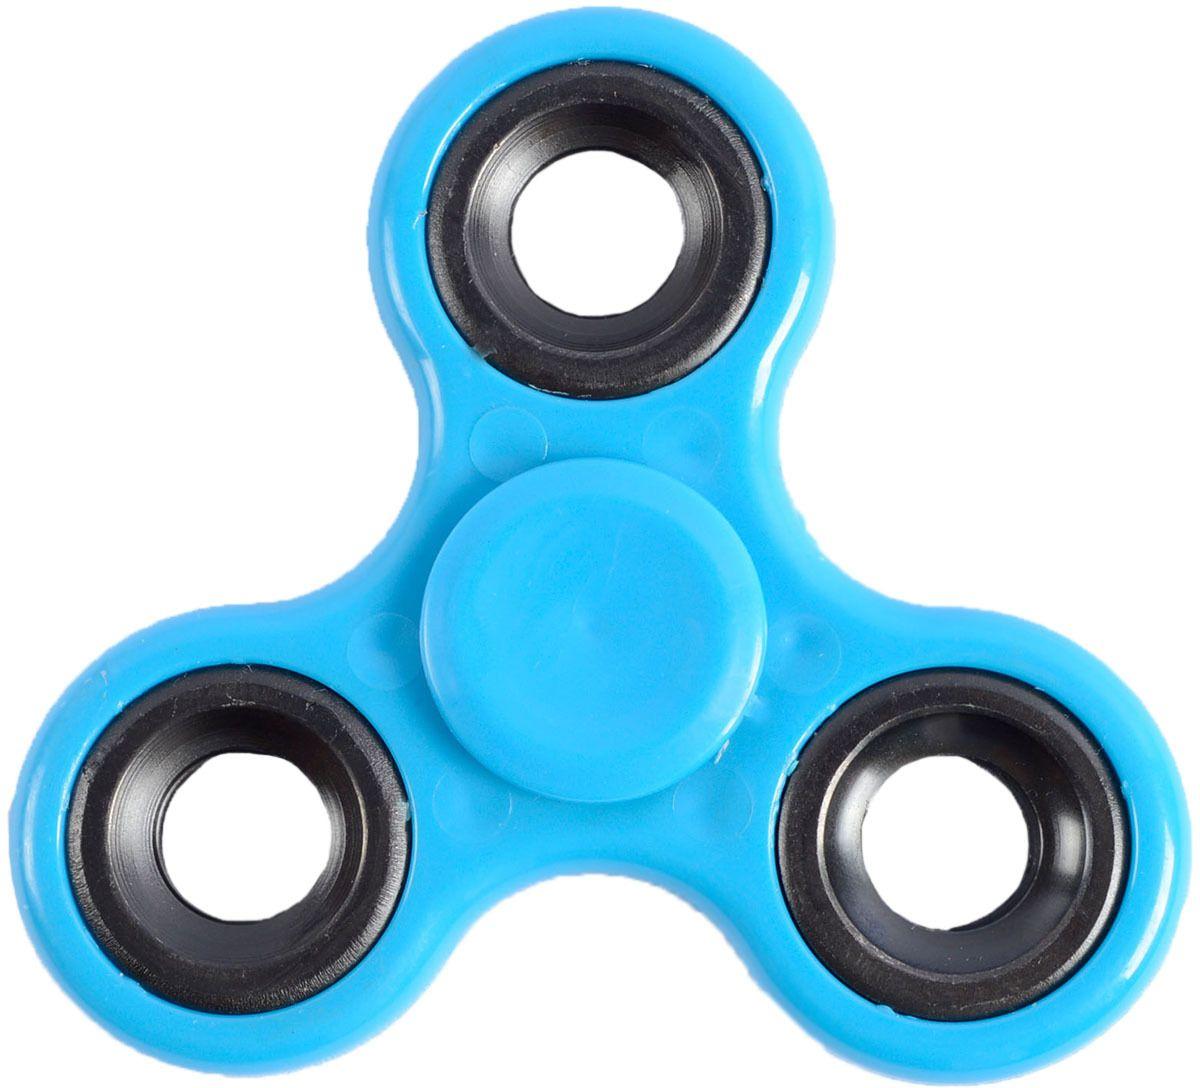 Fidget Spinner Спиннер Gyro цвет синий спиннер fidget spinner megamind м7266 pro 3 silver